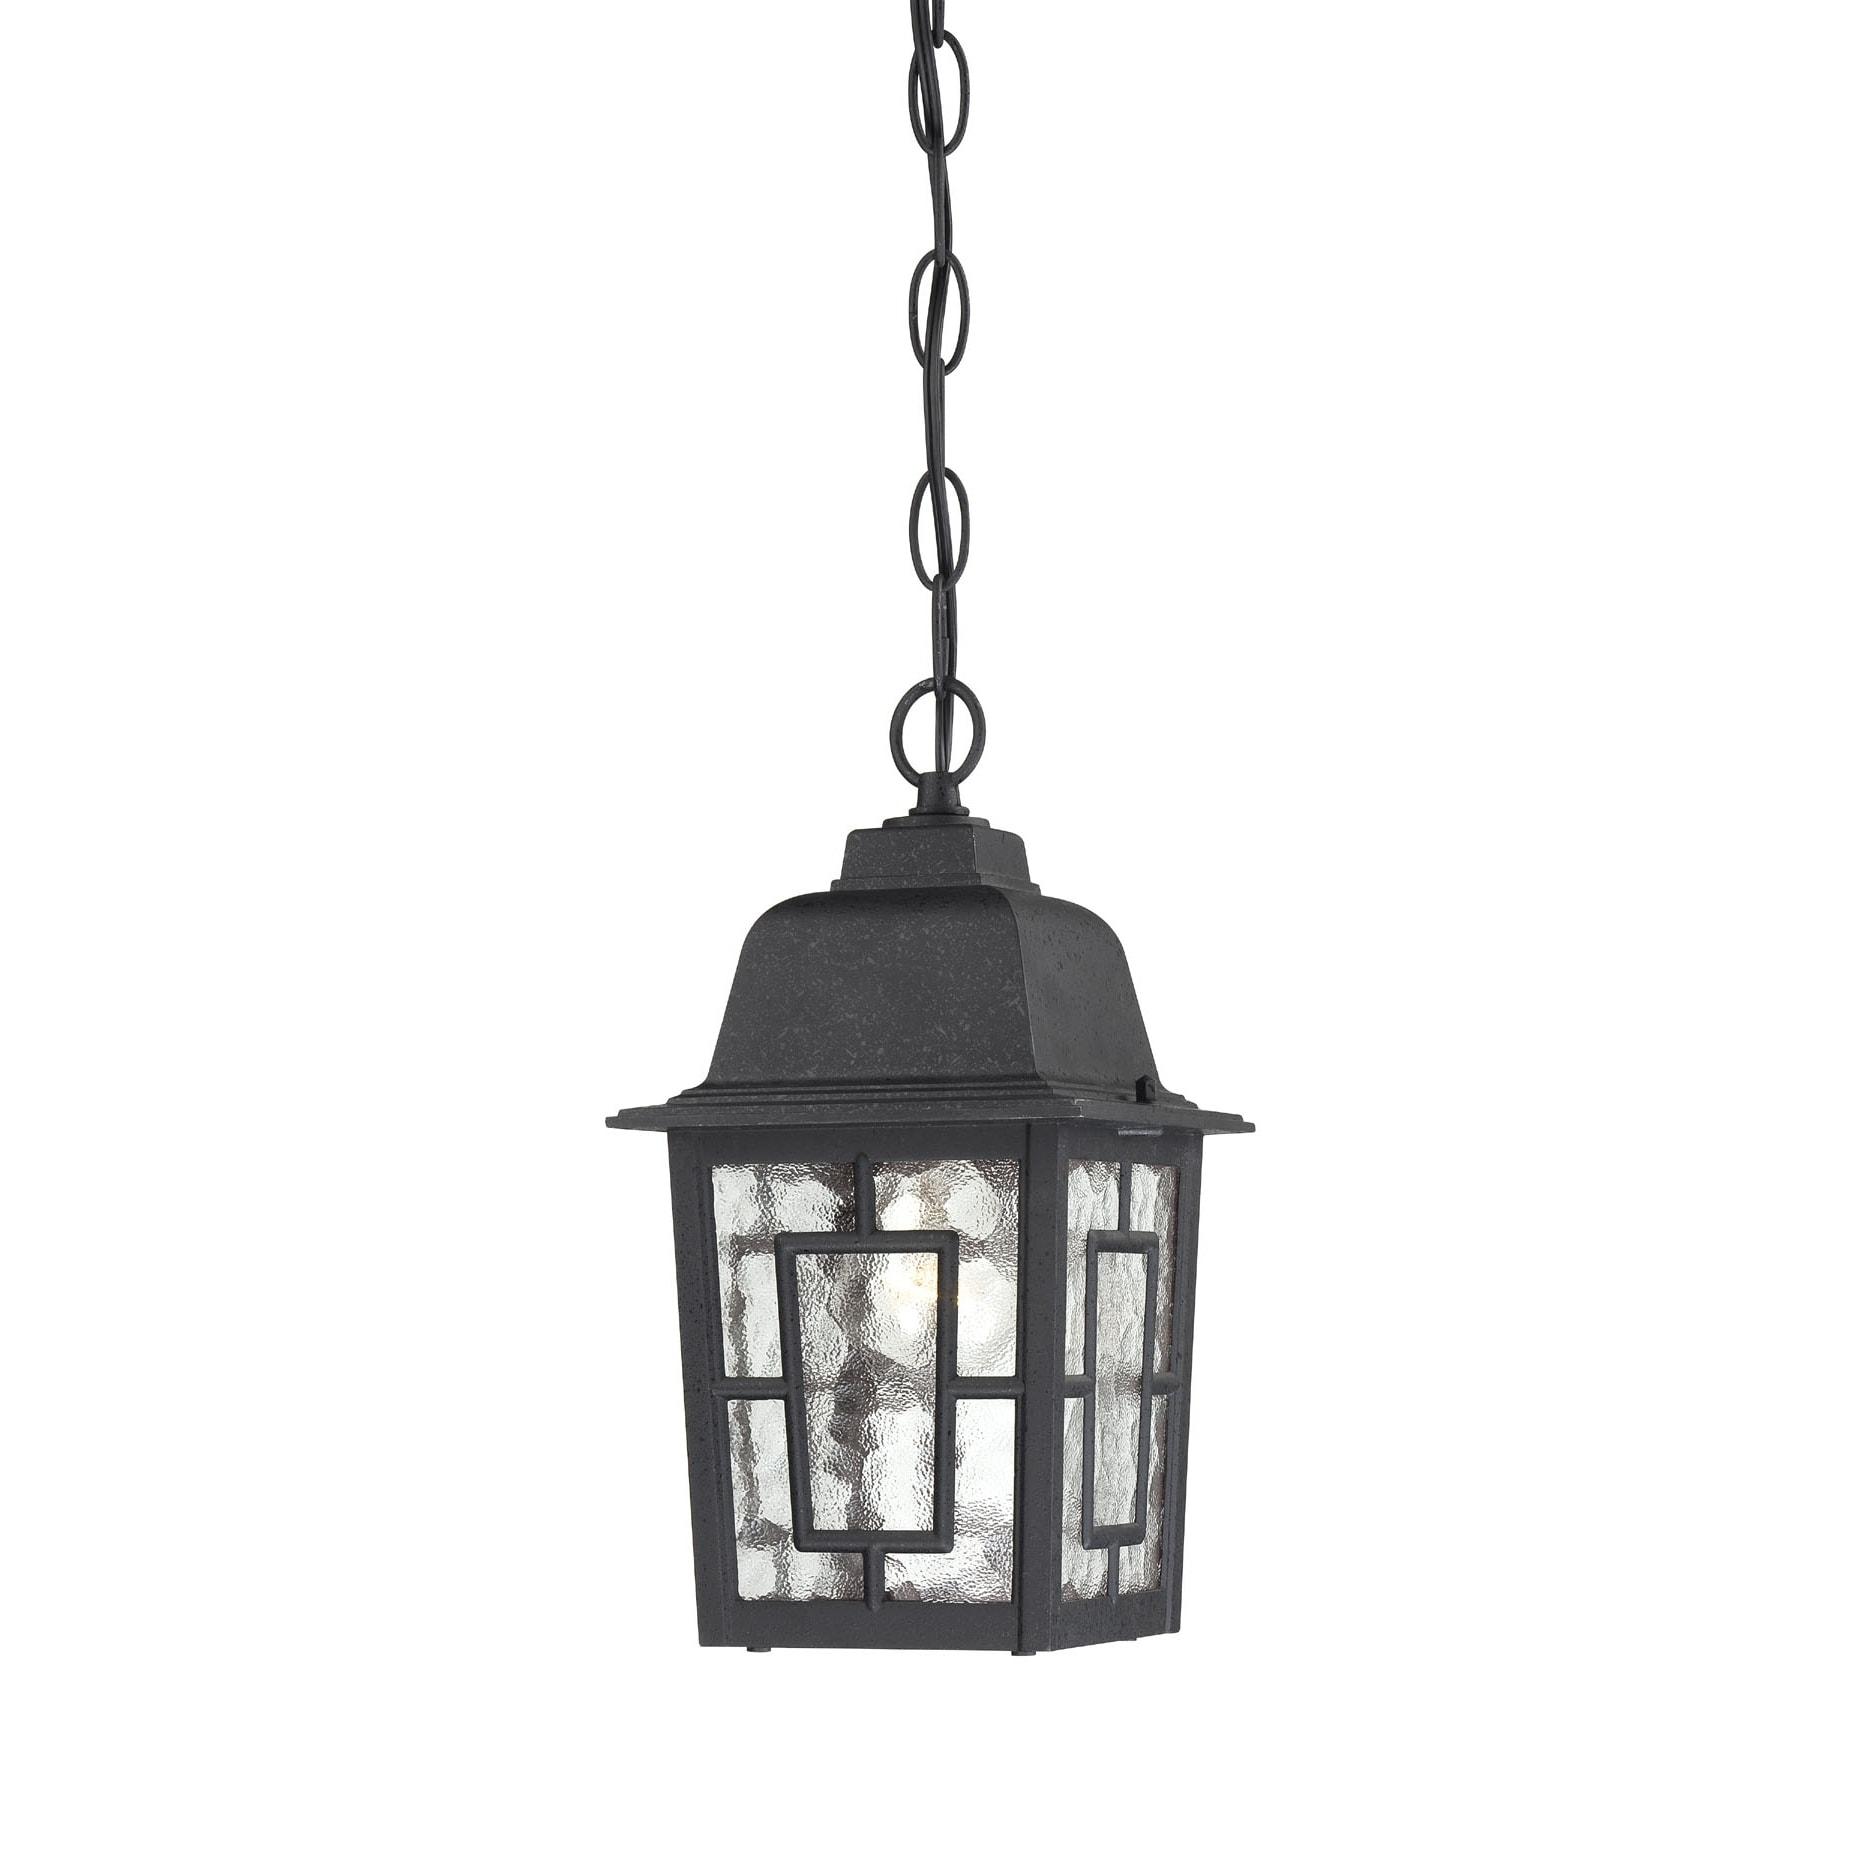 Nuvo Banyon 1-light Textured Black 11-inch Hanging Fixture